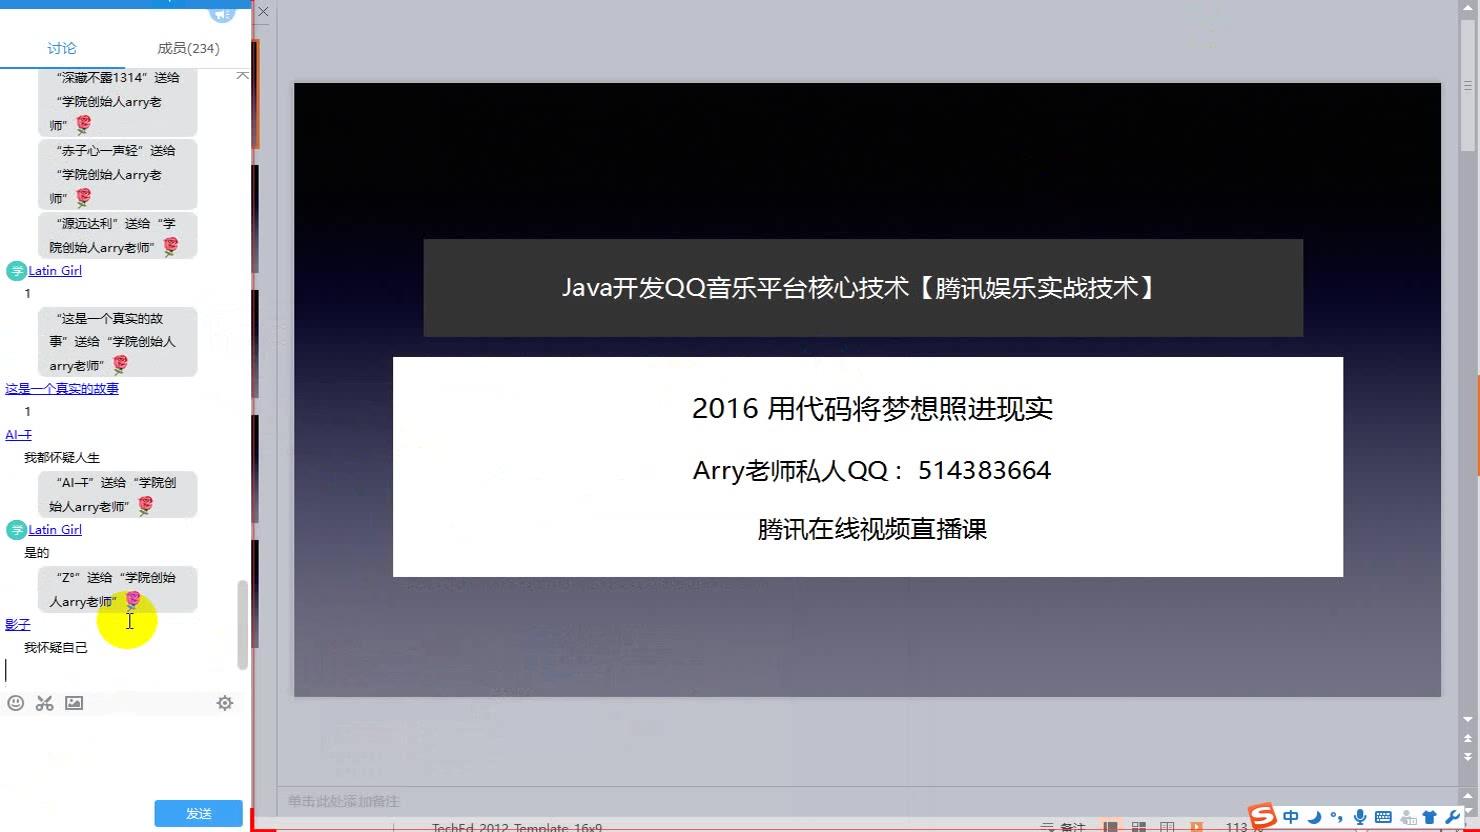 Java开发QQ音乐平台核心技术腾讯娱乐实战技术